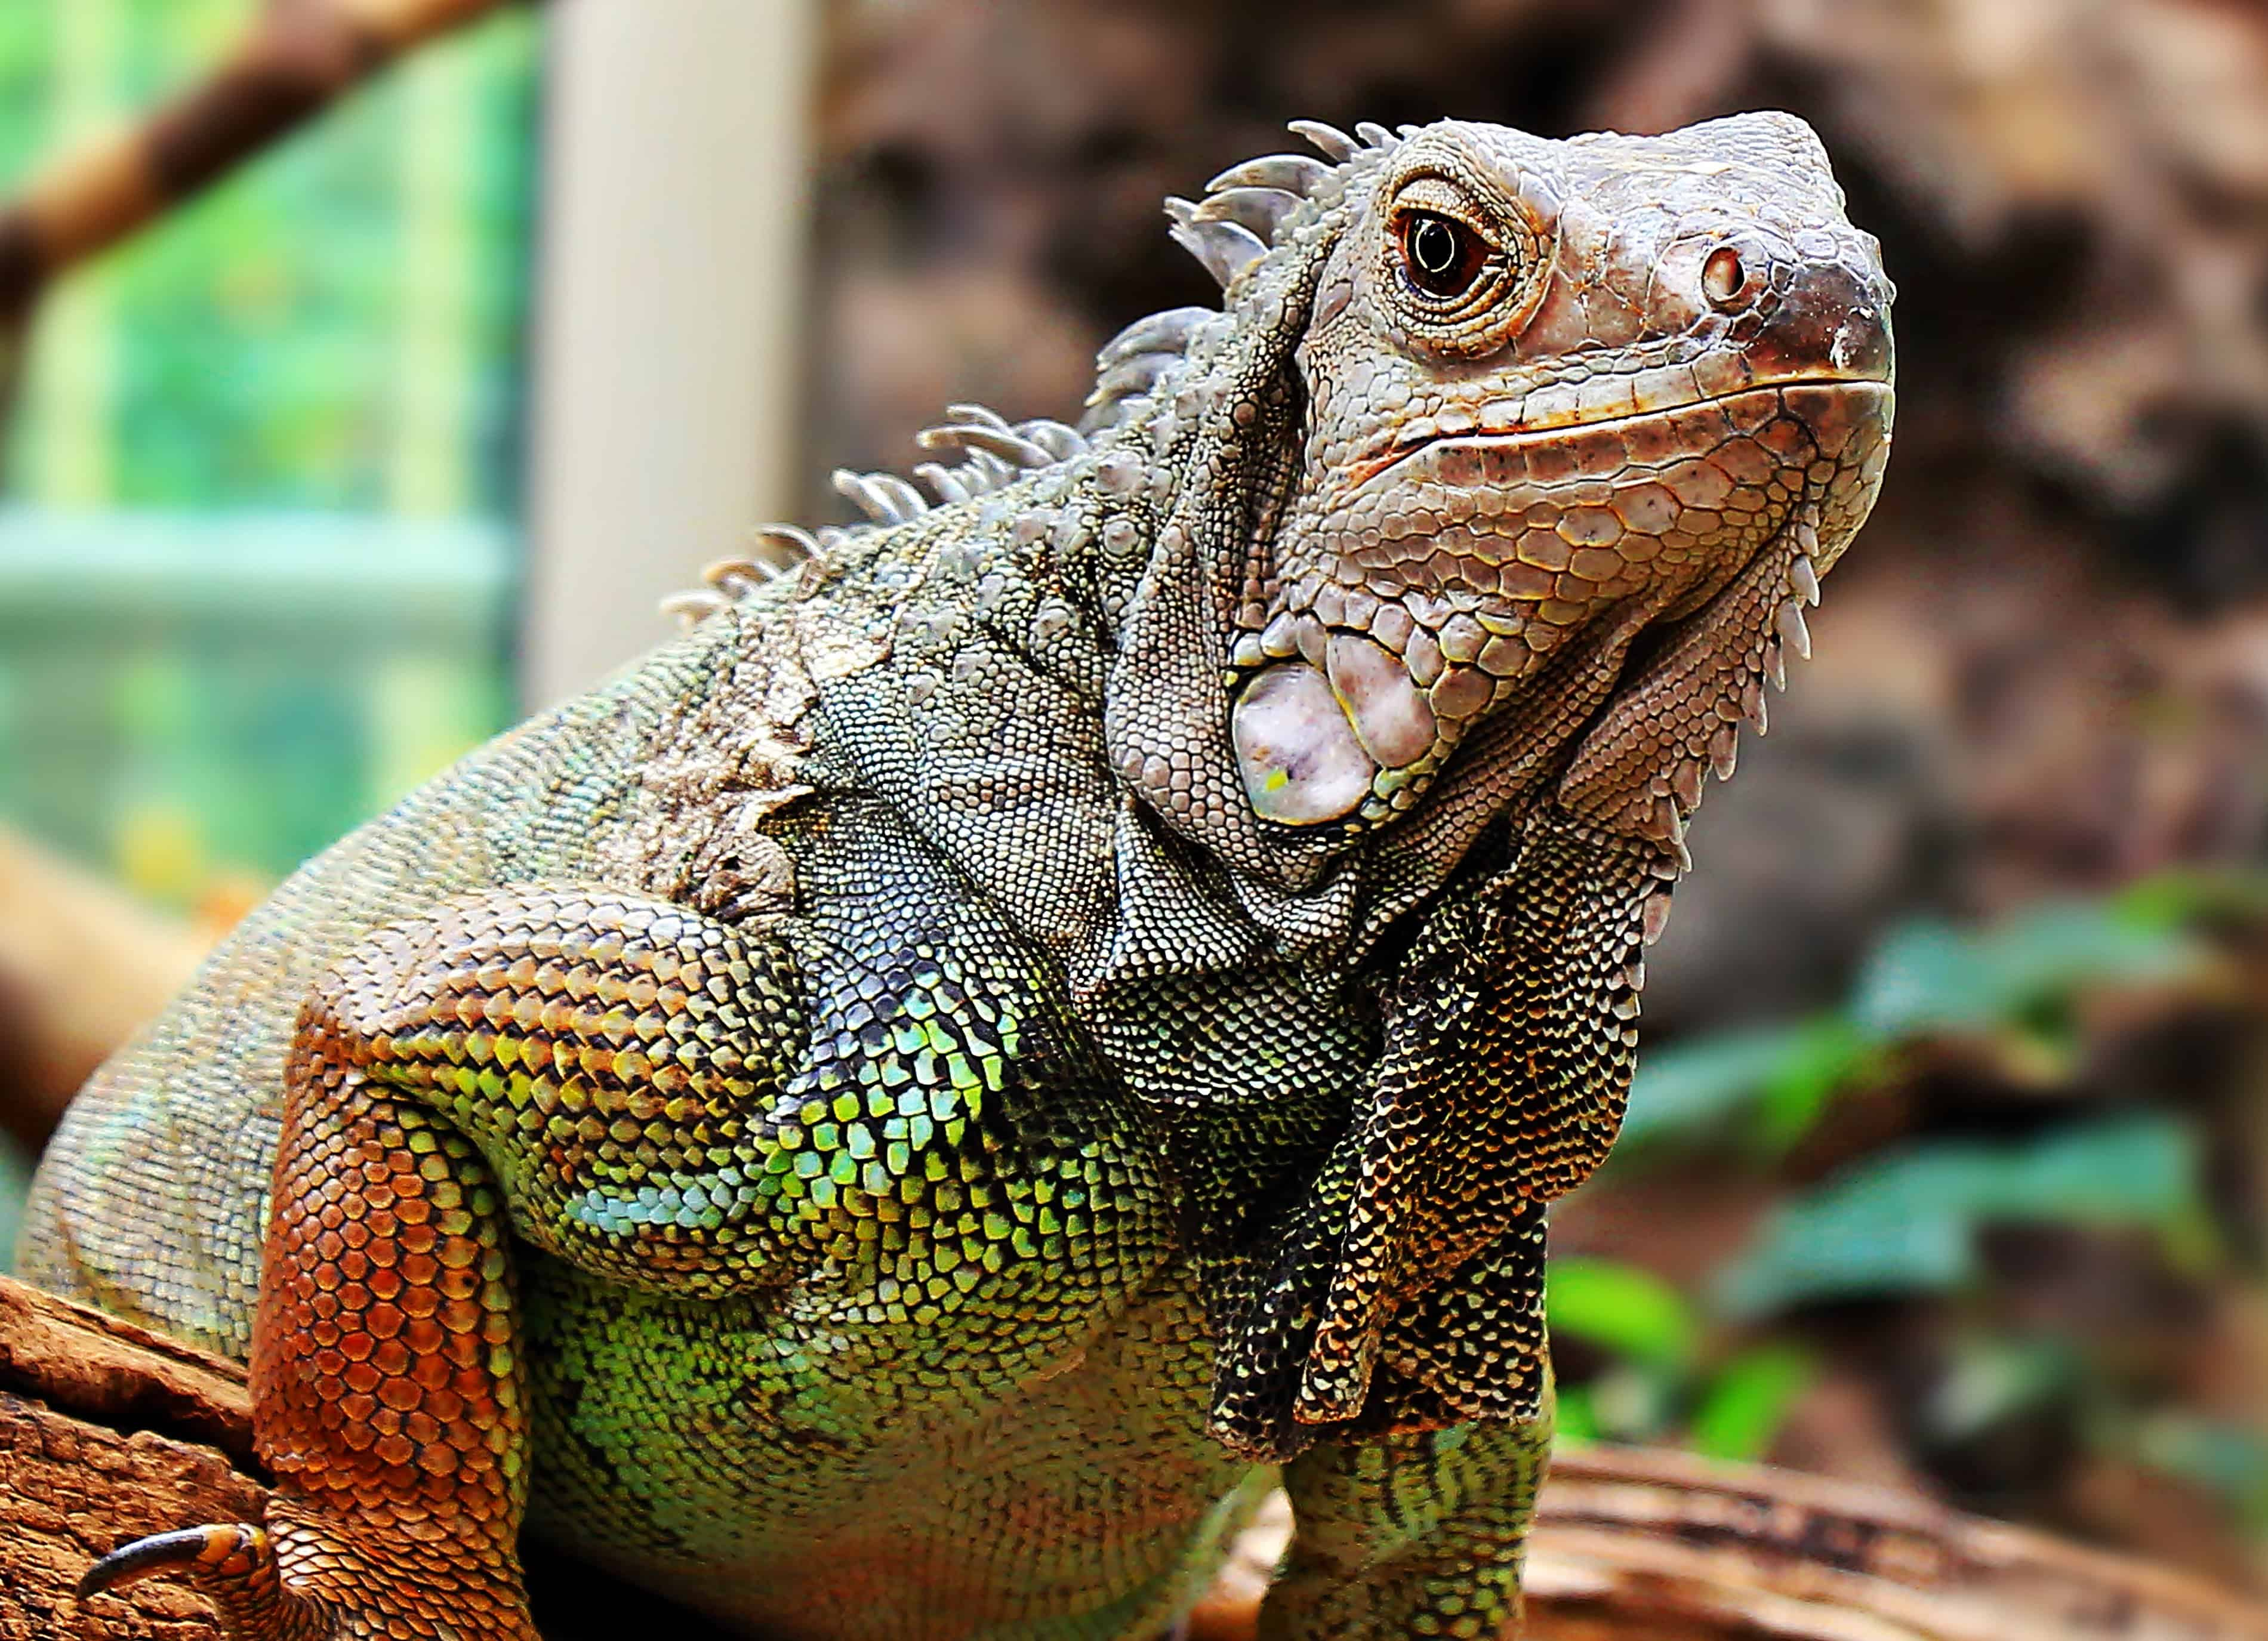 iguana lizard animal dragon reptile wild wildlife nature reptiles animals lizards jooinn